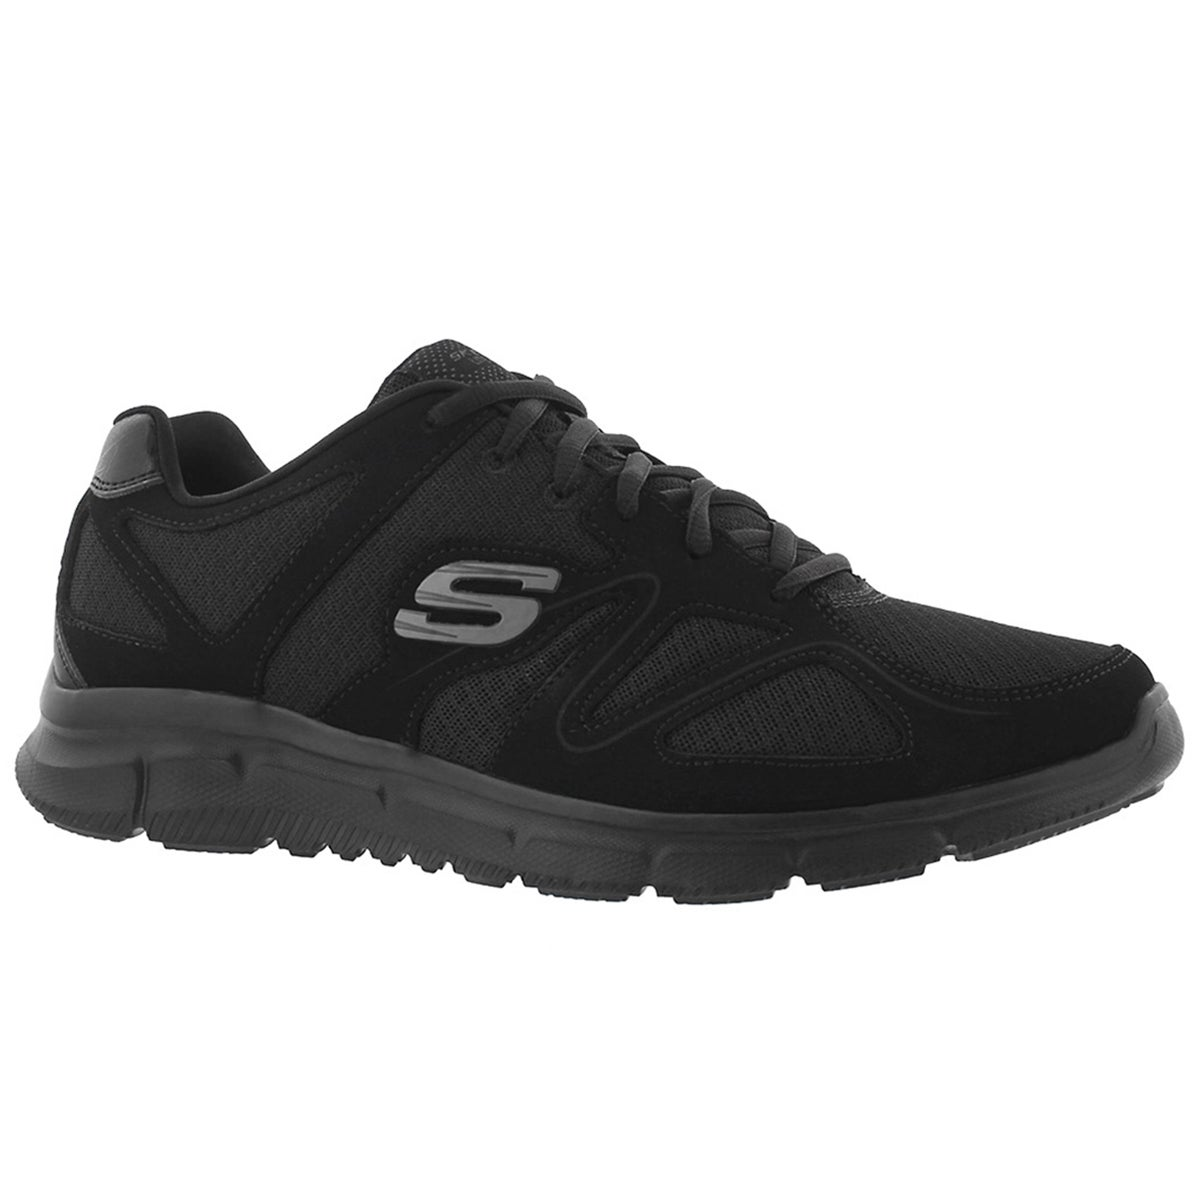 Mens VERSE- FLASH POINT black running shoe